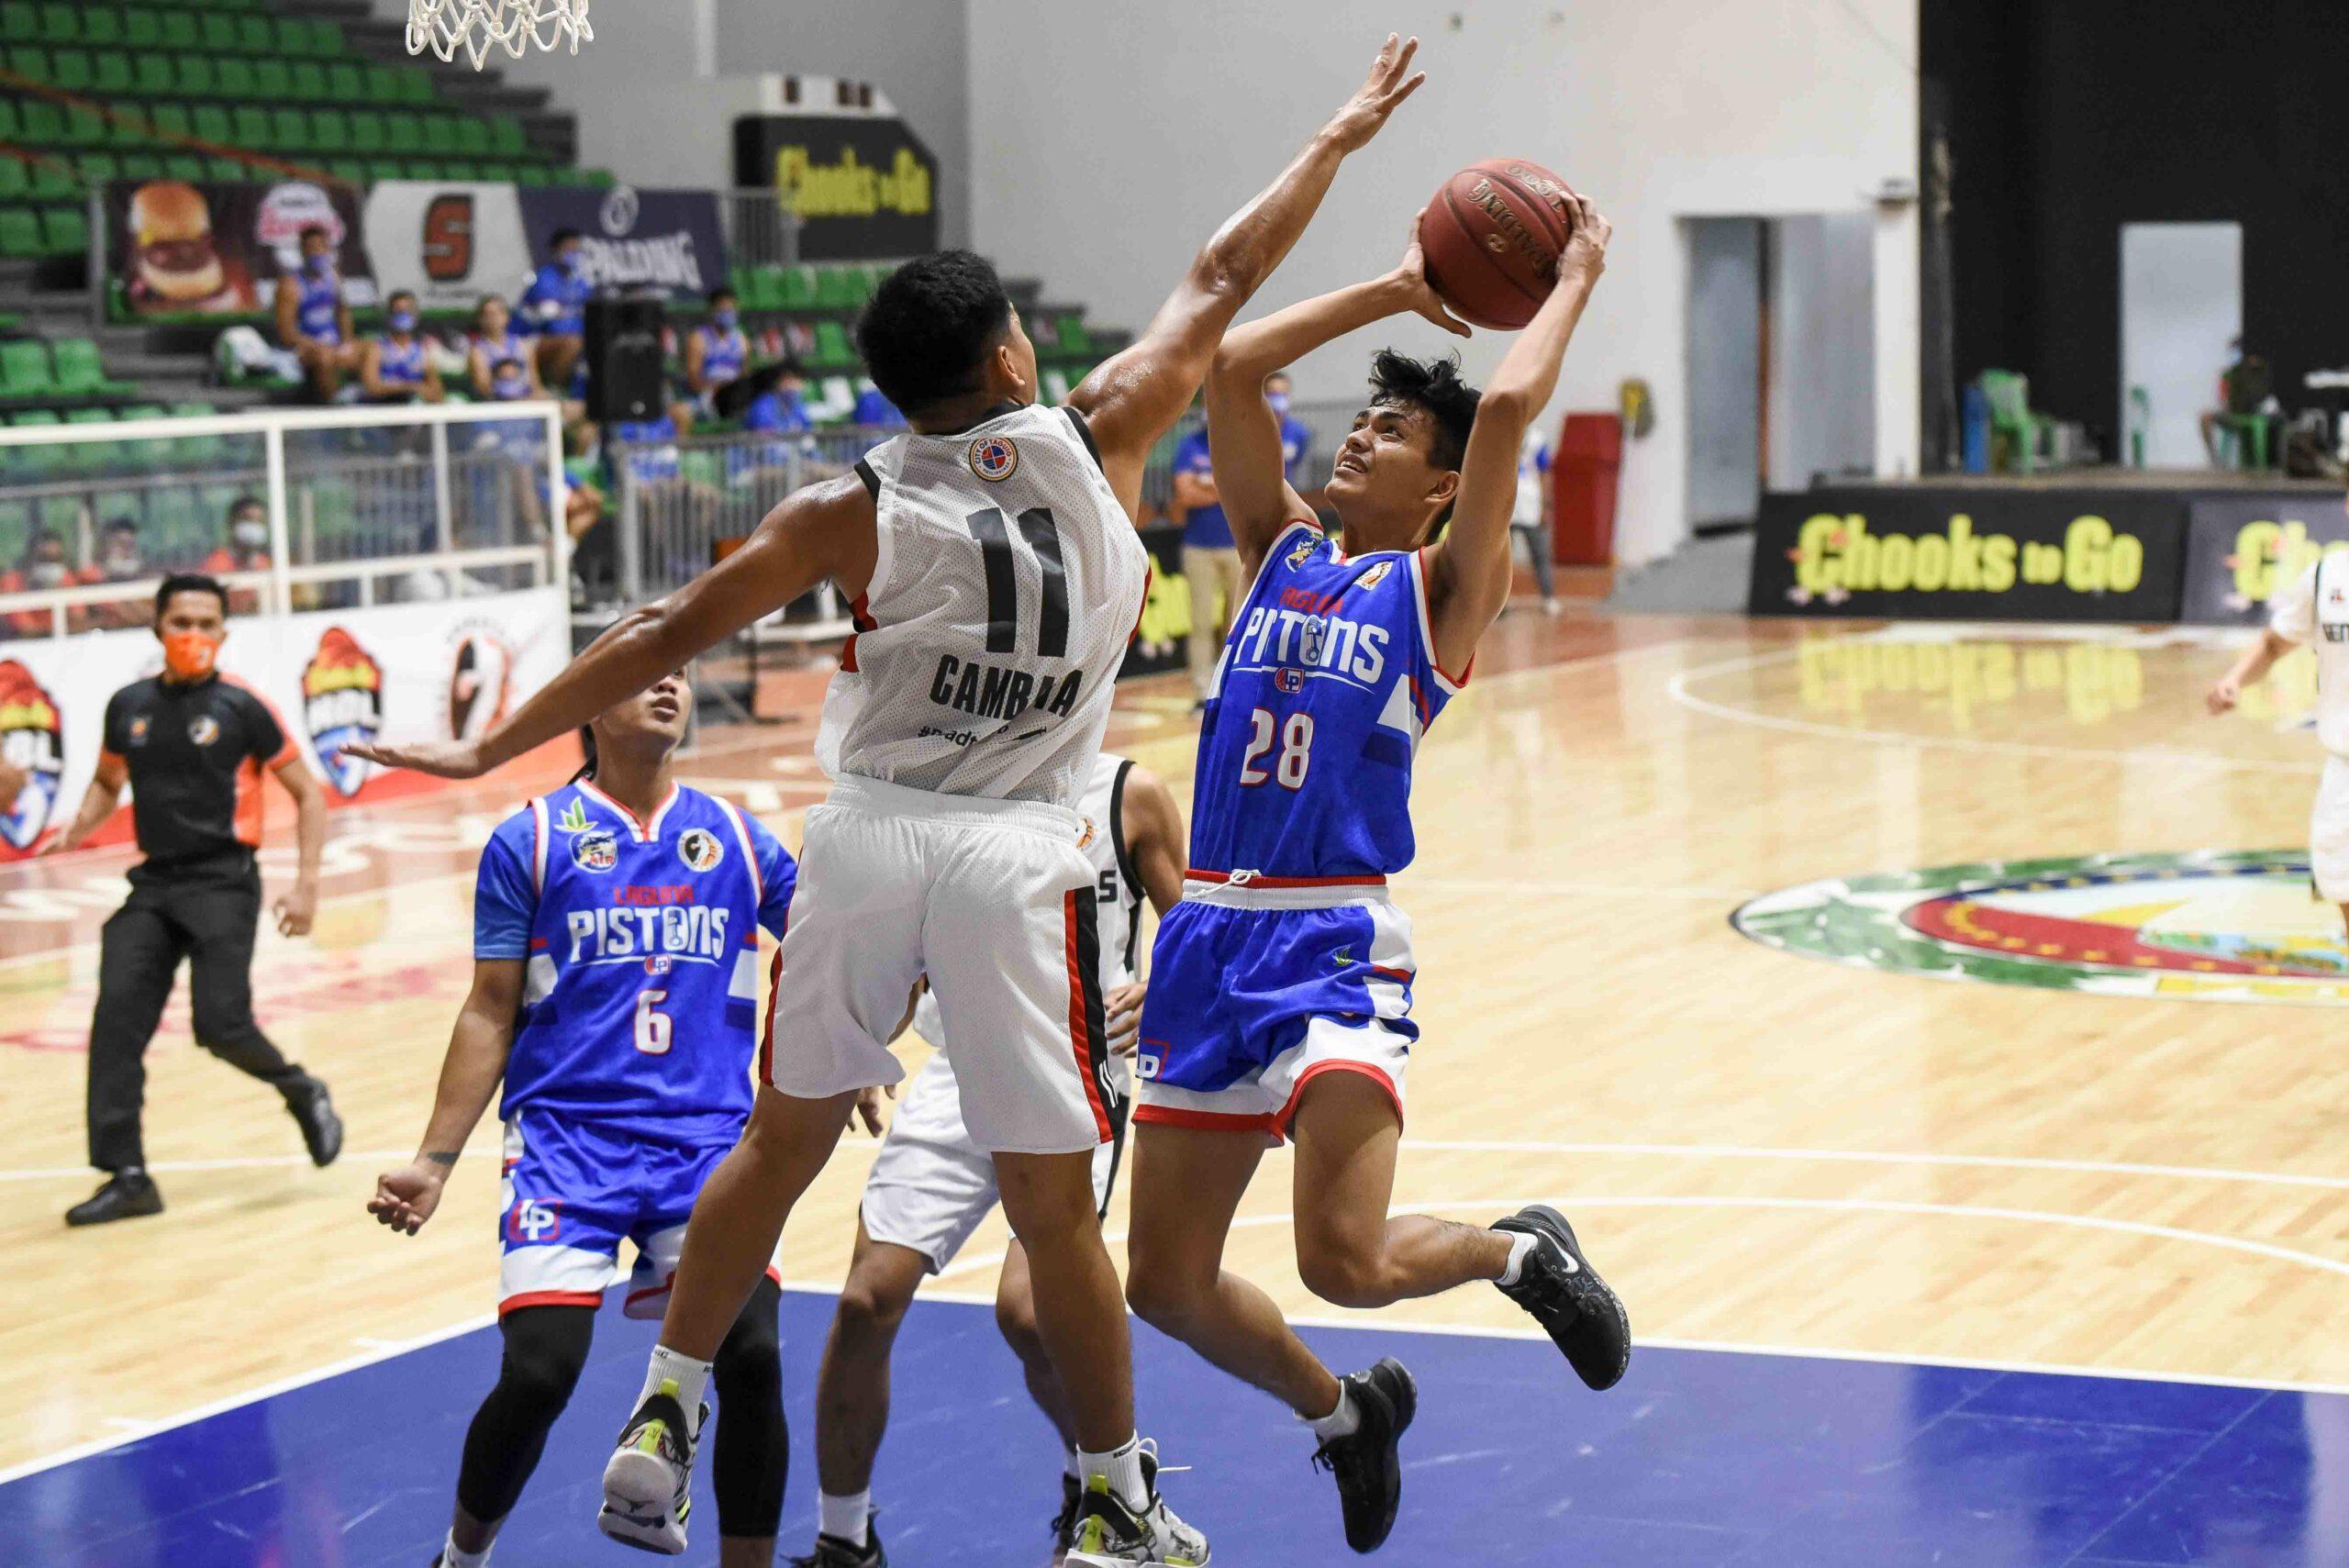 2021-Chooks-NBL-Taguig-vs-Laguna-Sean-Sandoval-scaled Francisco Tancioco catches fire as Taguig survives Laguna to go to 2-0 in NBL Basketball NBL News  - philippine sports news